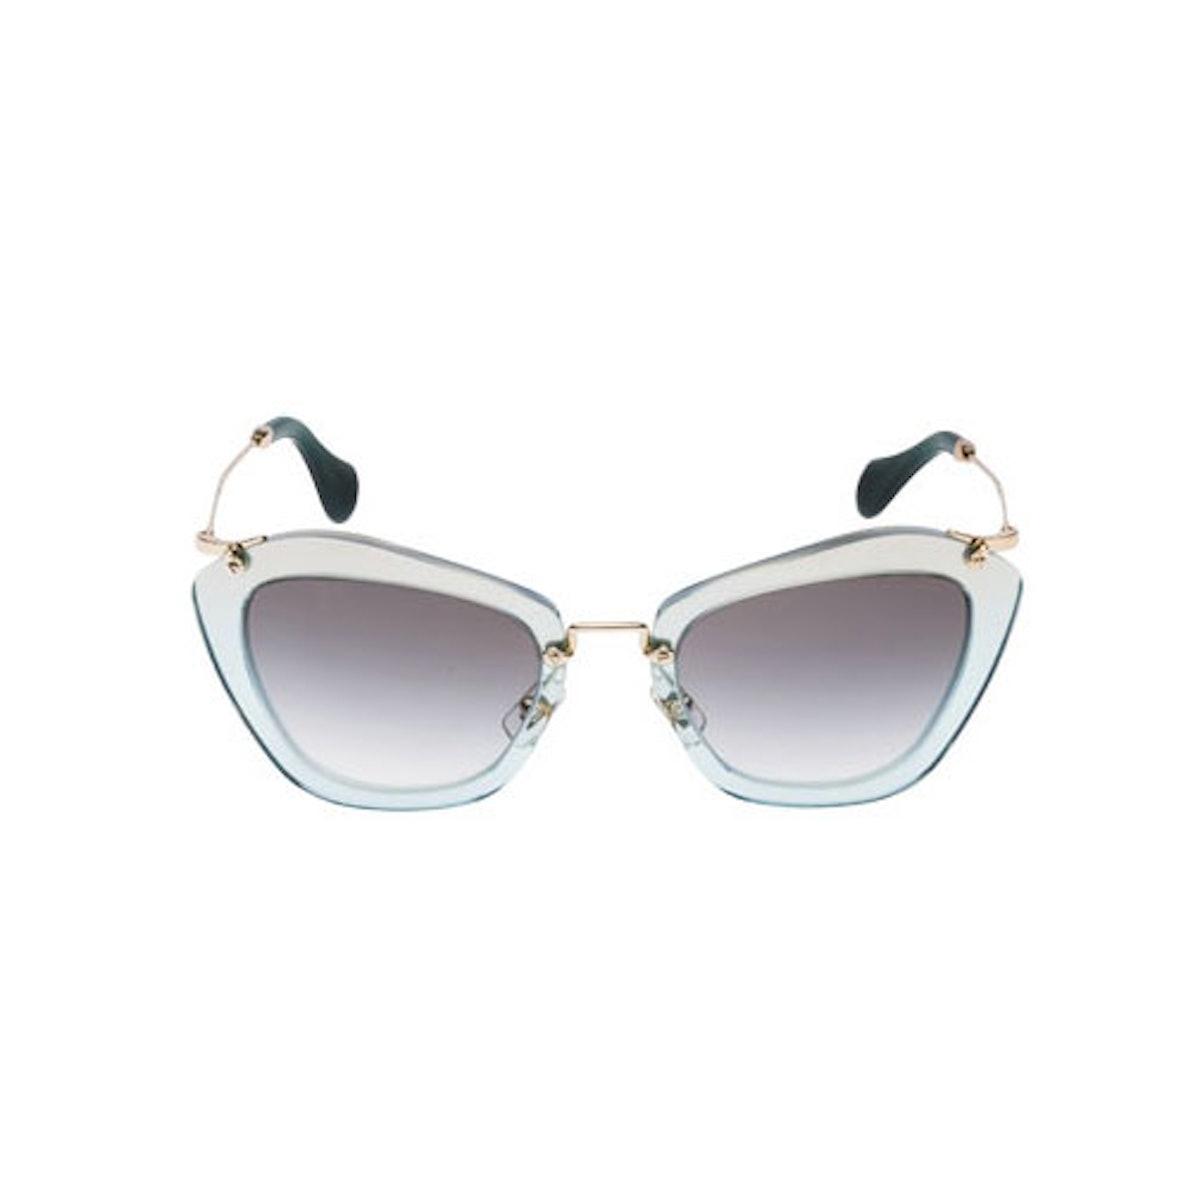 "Miu Miu ""Noir"" sunglasses"